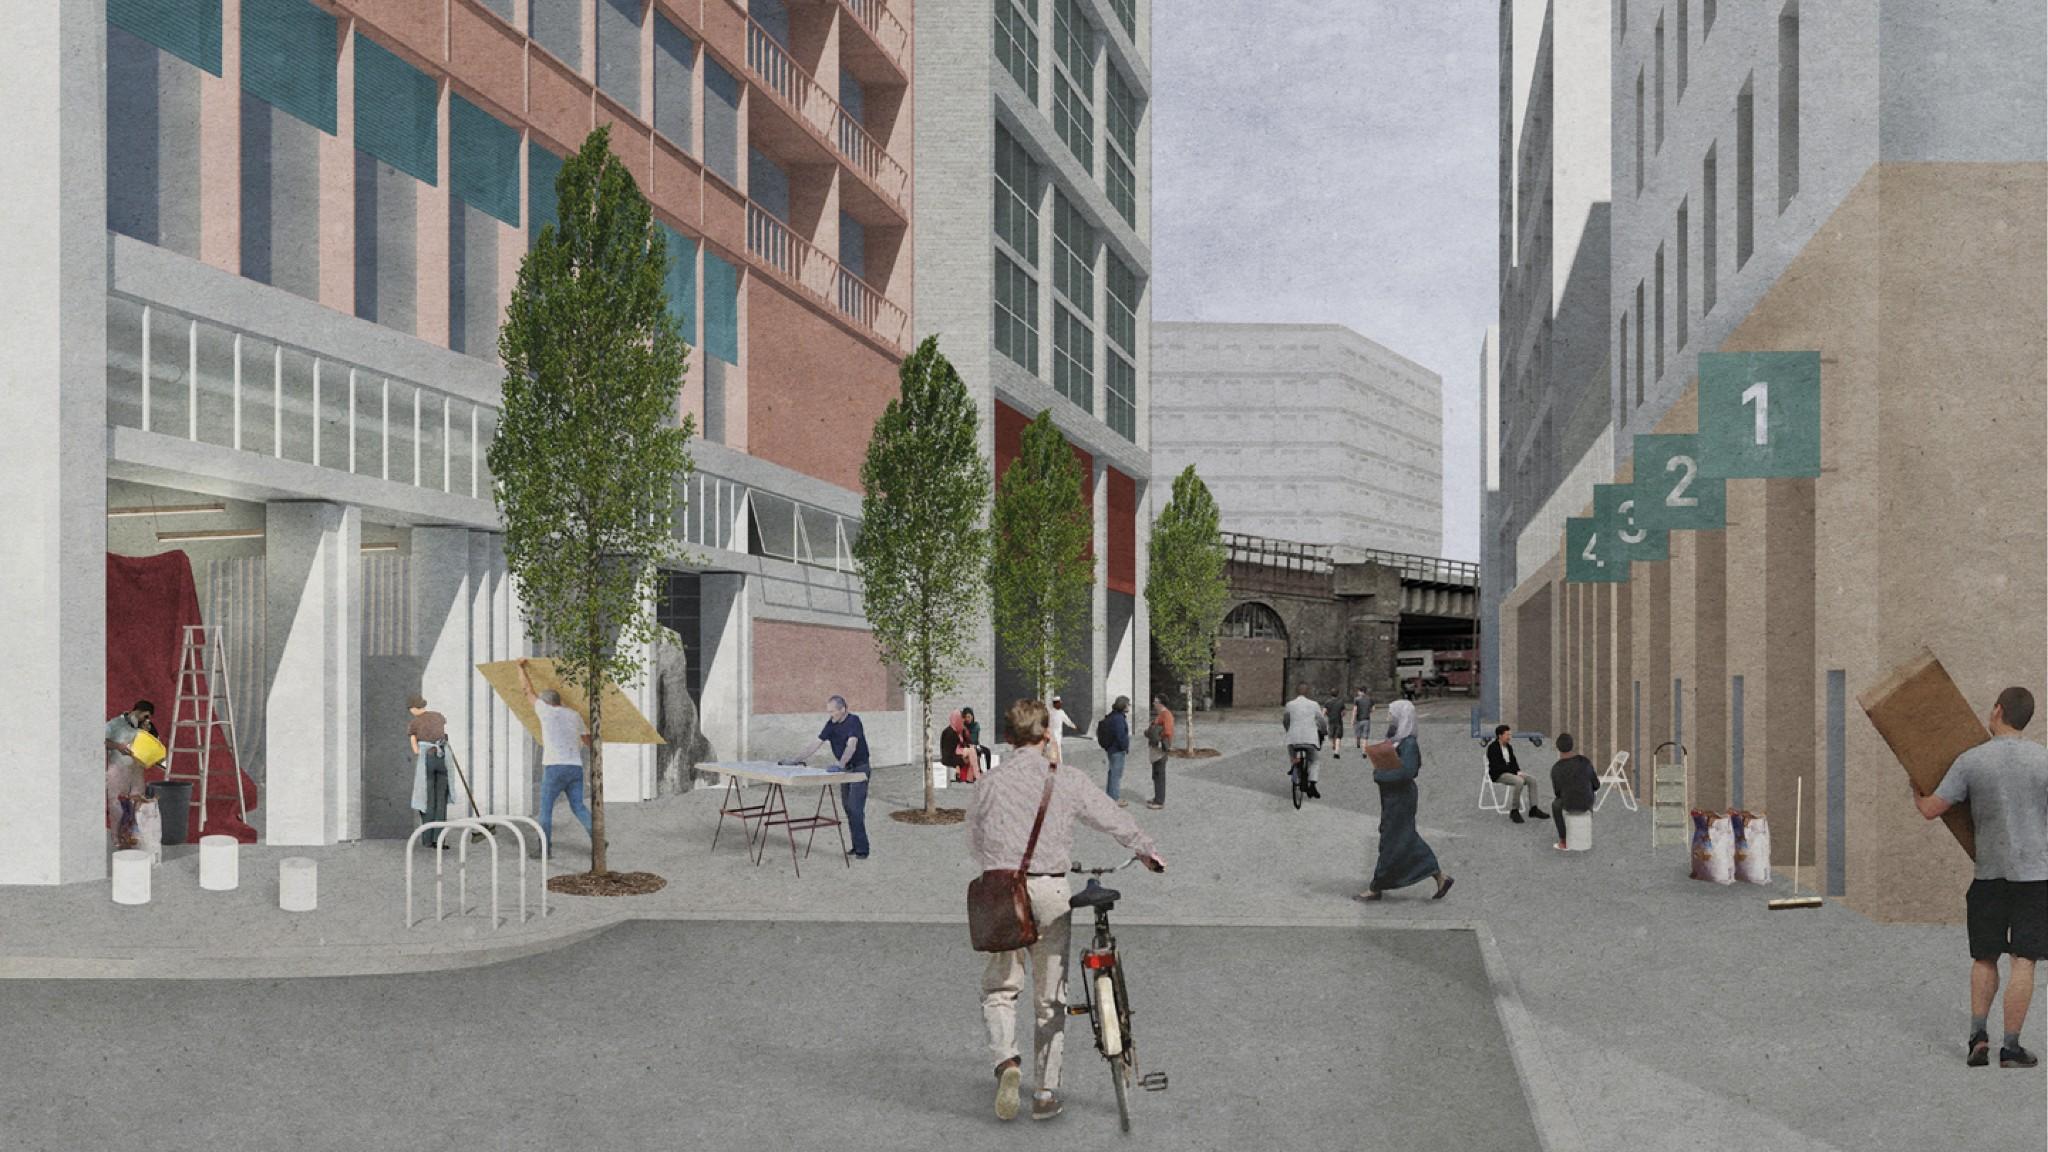 Battersea Design and Technology Quarter